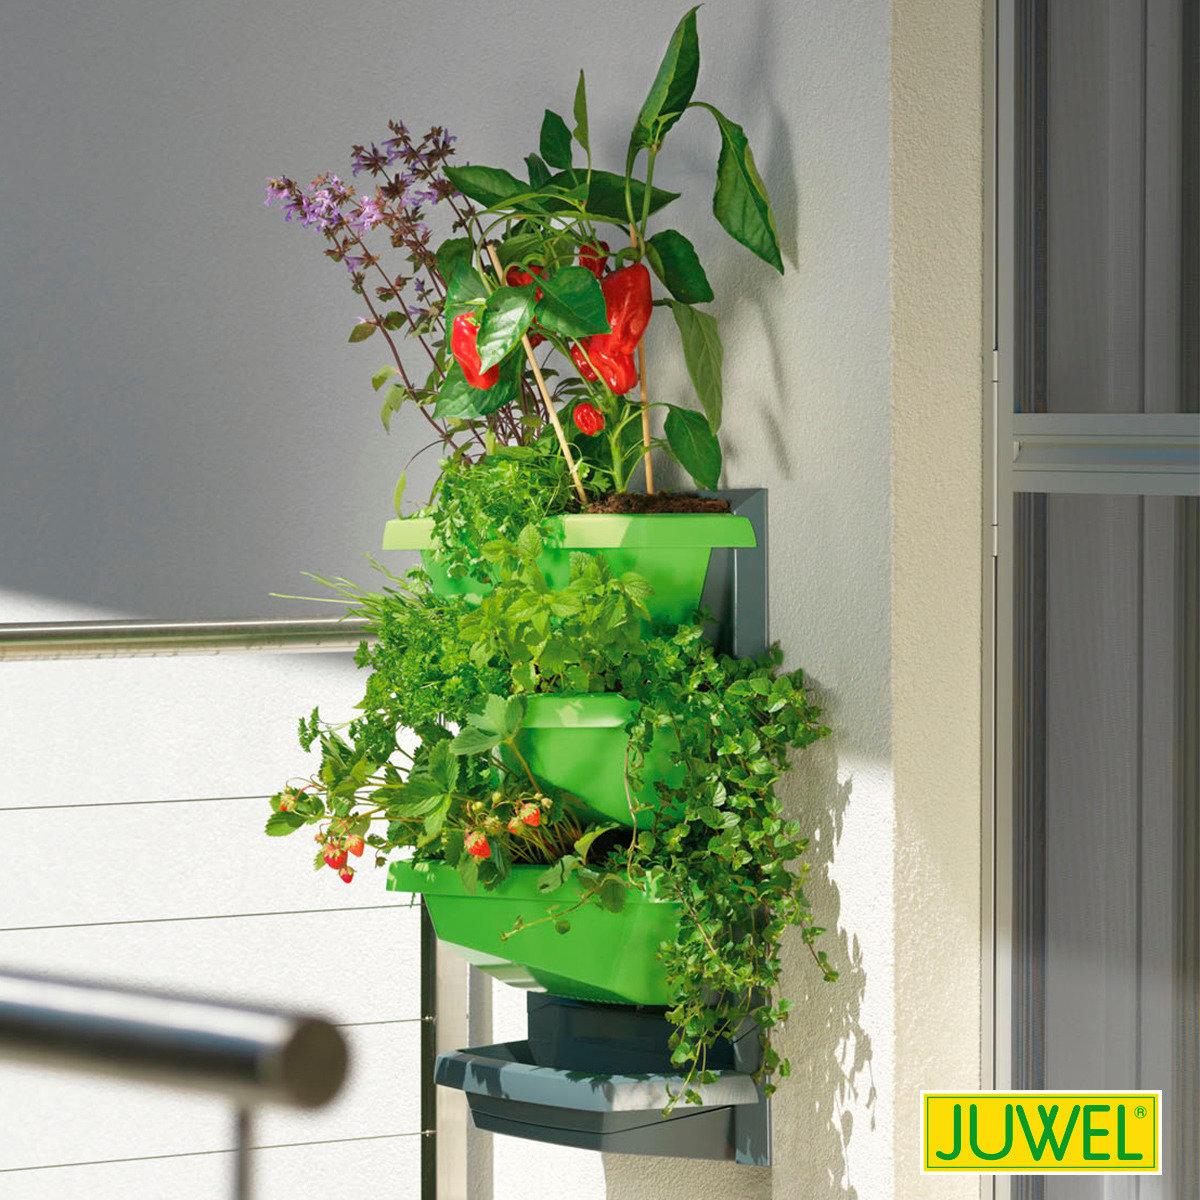 JUWEL Vertical Garden Grundelement, limette